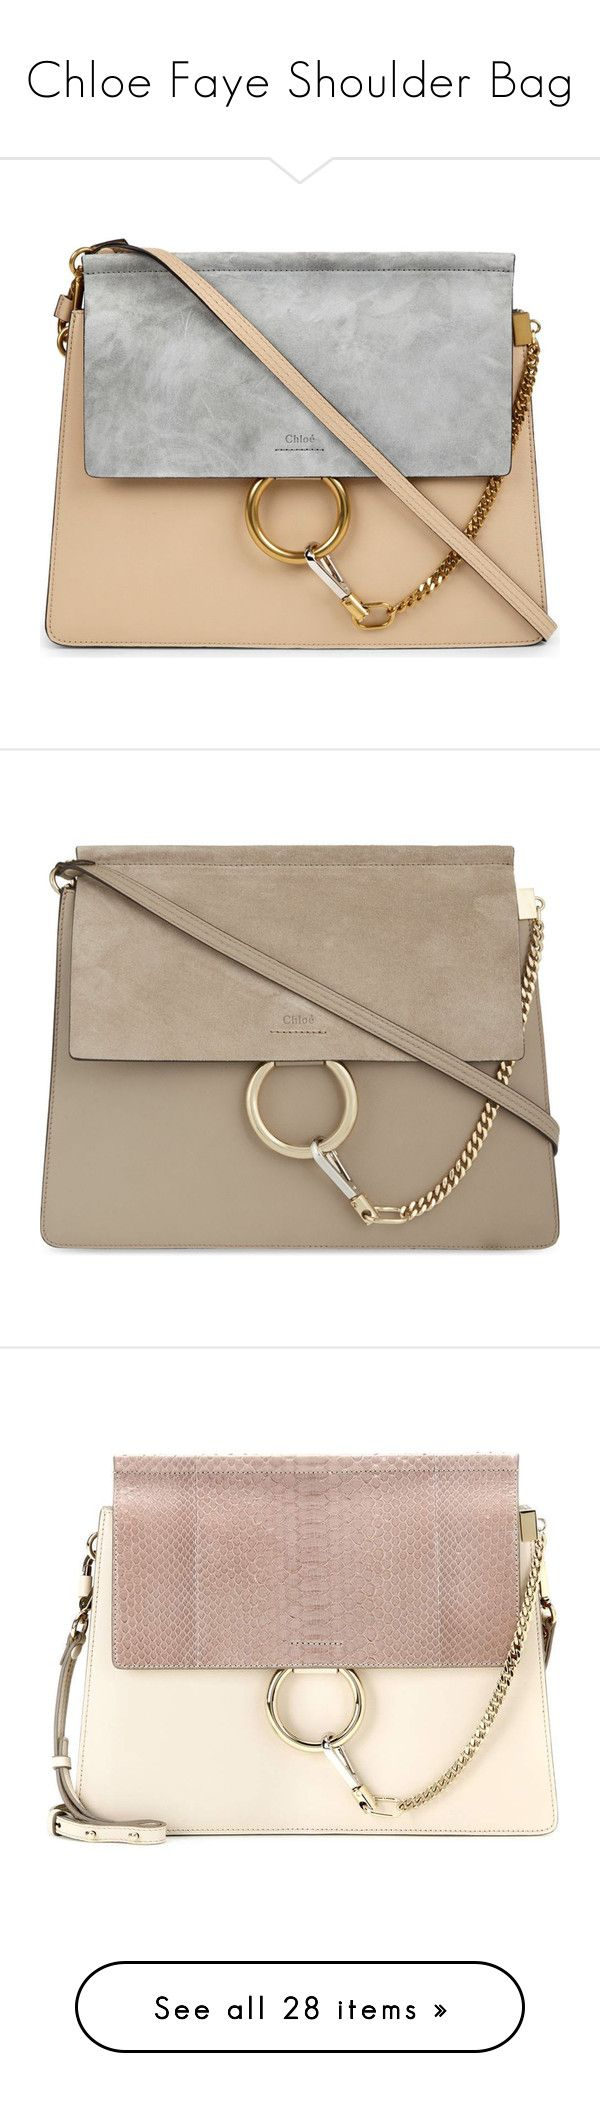 """Chloe Faye Shoulder Bag"" by mplusk ❤ liked on Polyvore featuring bags, handbags, handbag satchel, satchel hand bags, satchel handbags, chloe satchel, suede leather handbags, black, real leather handbags and chloe handbags"